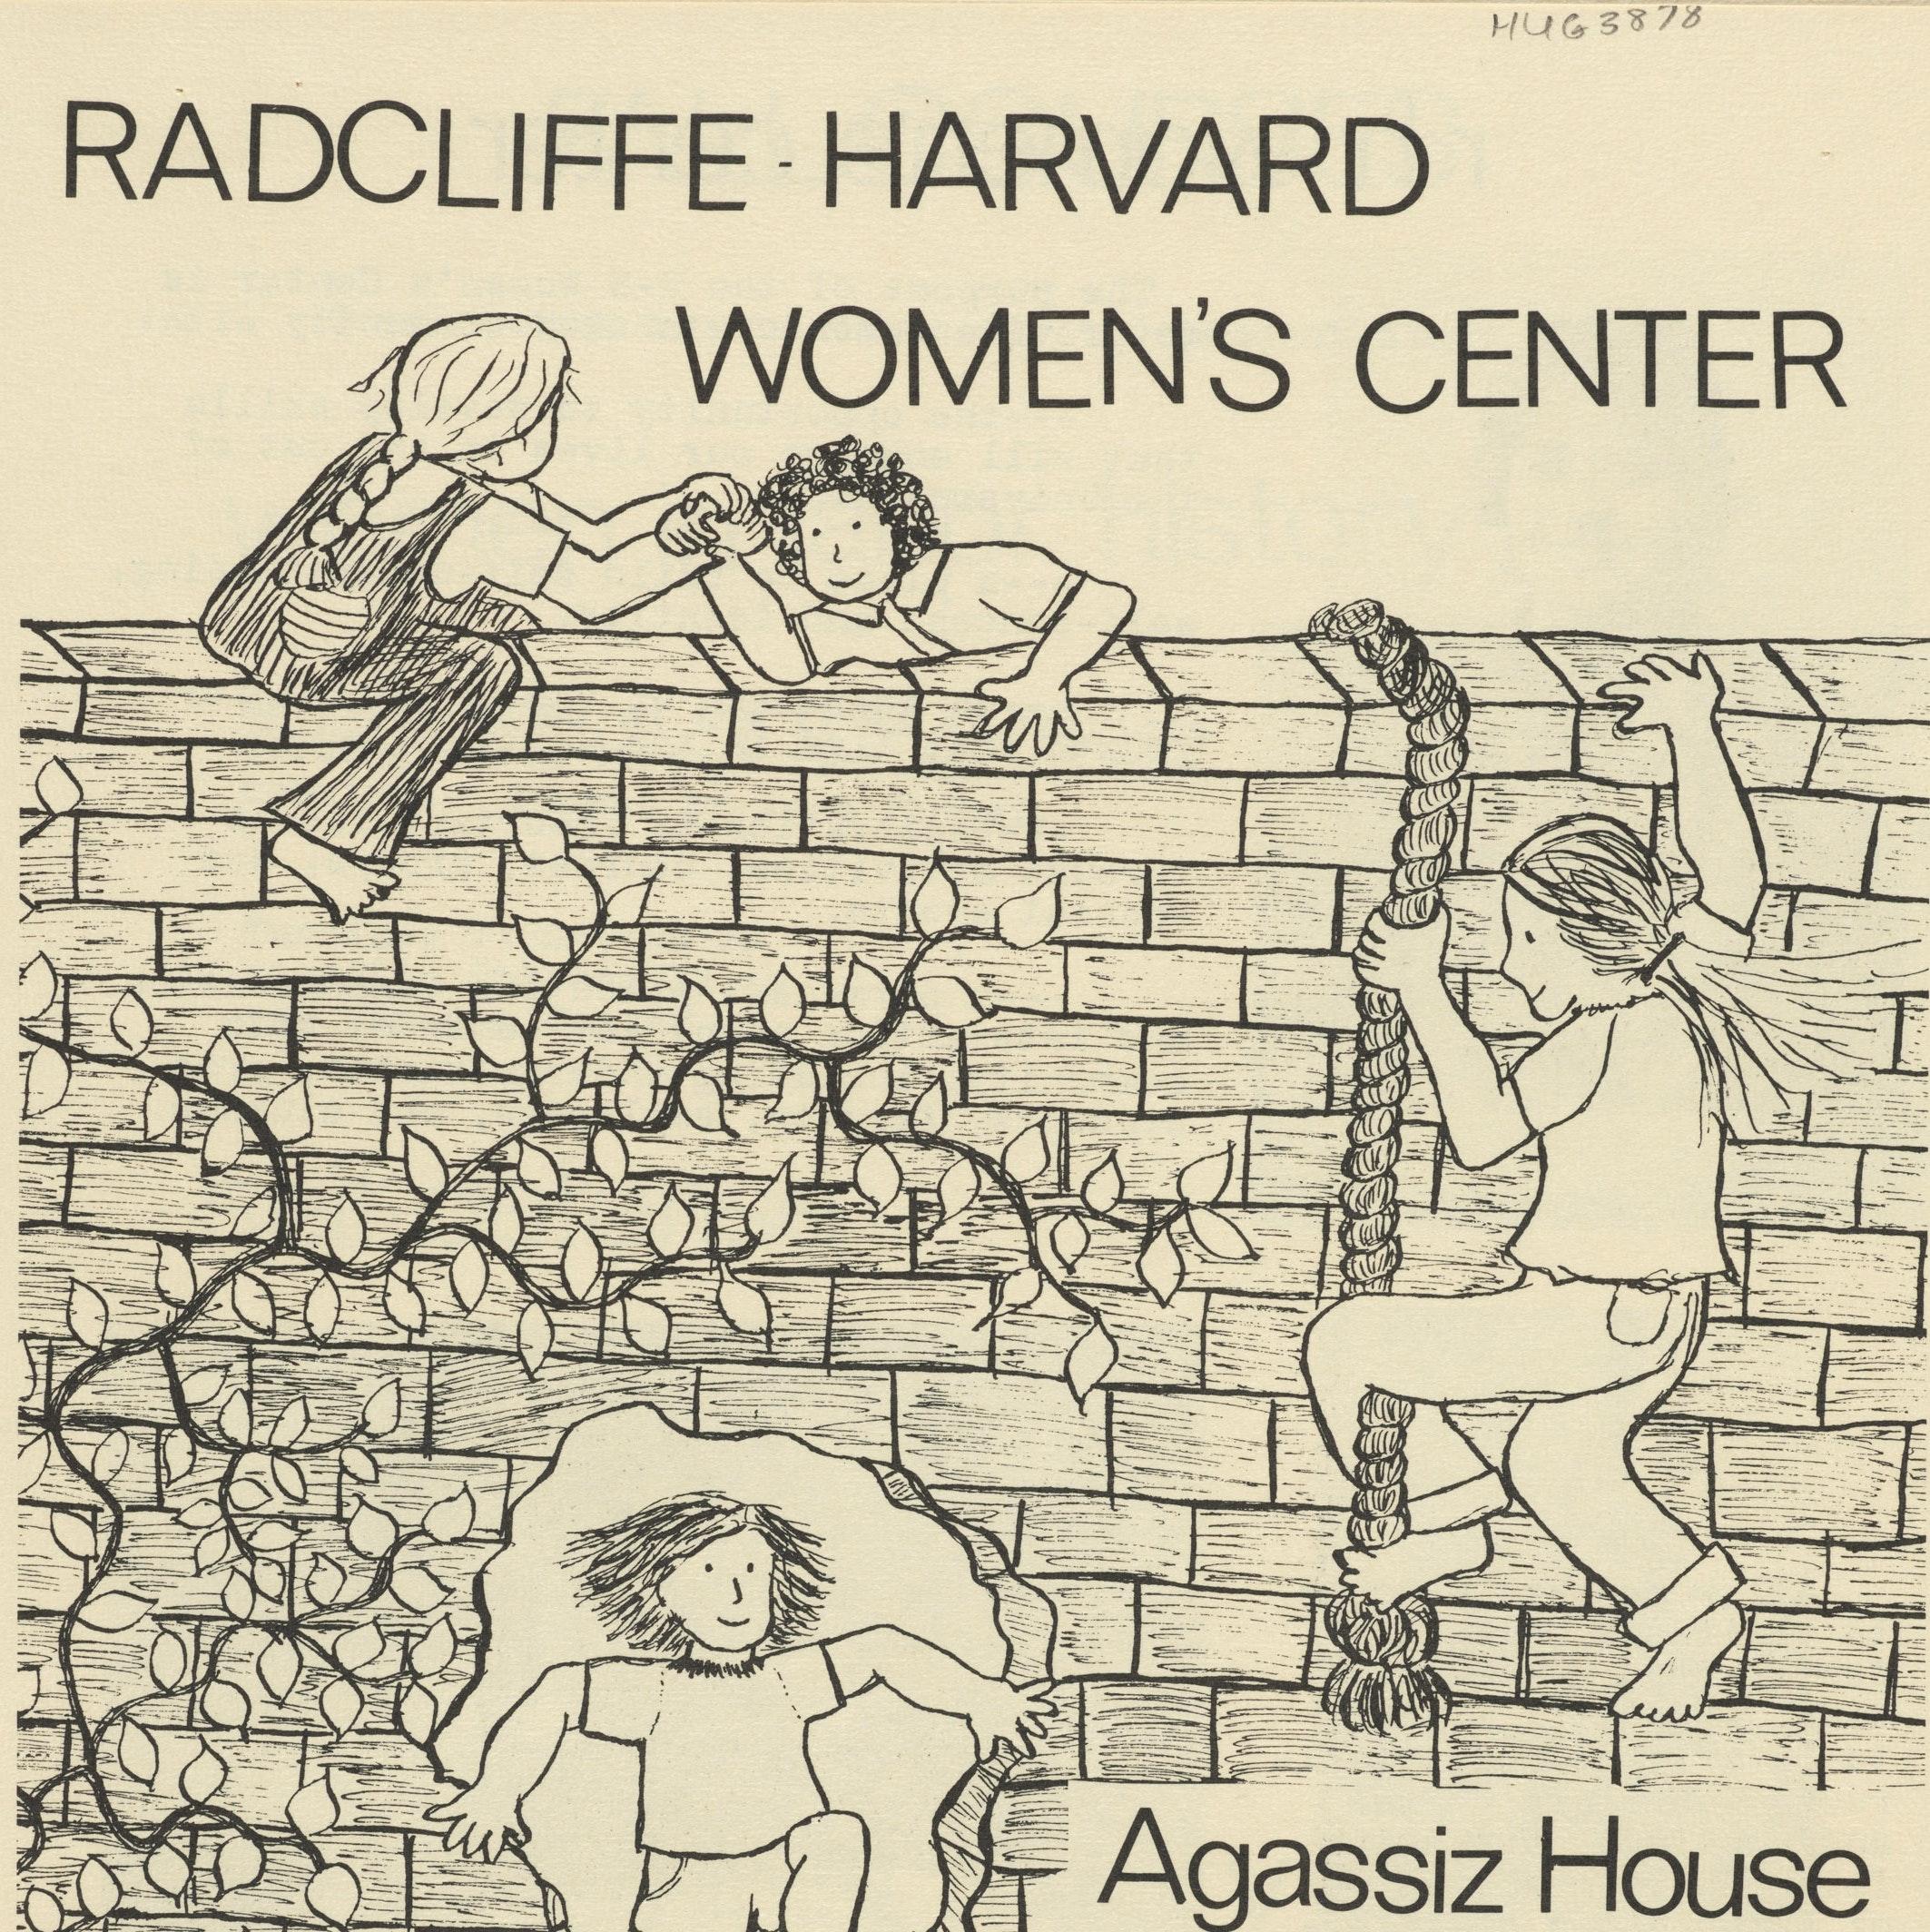 Radcliffe-Harvard Women's Center Newsletter